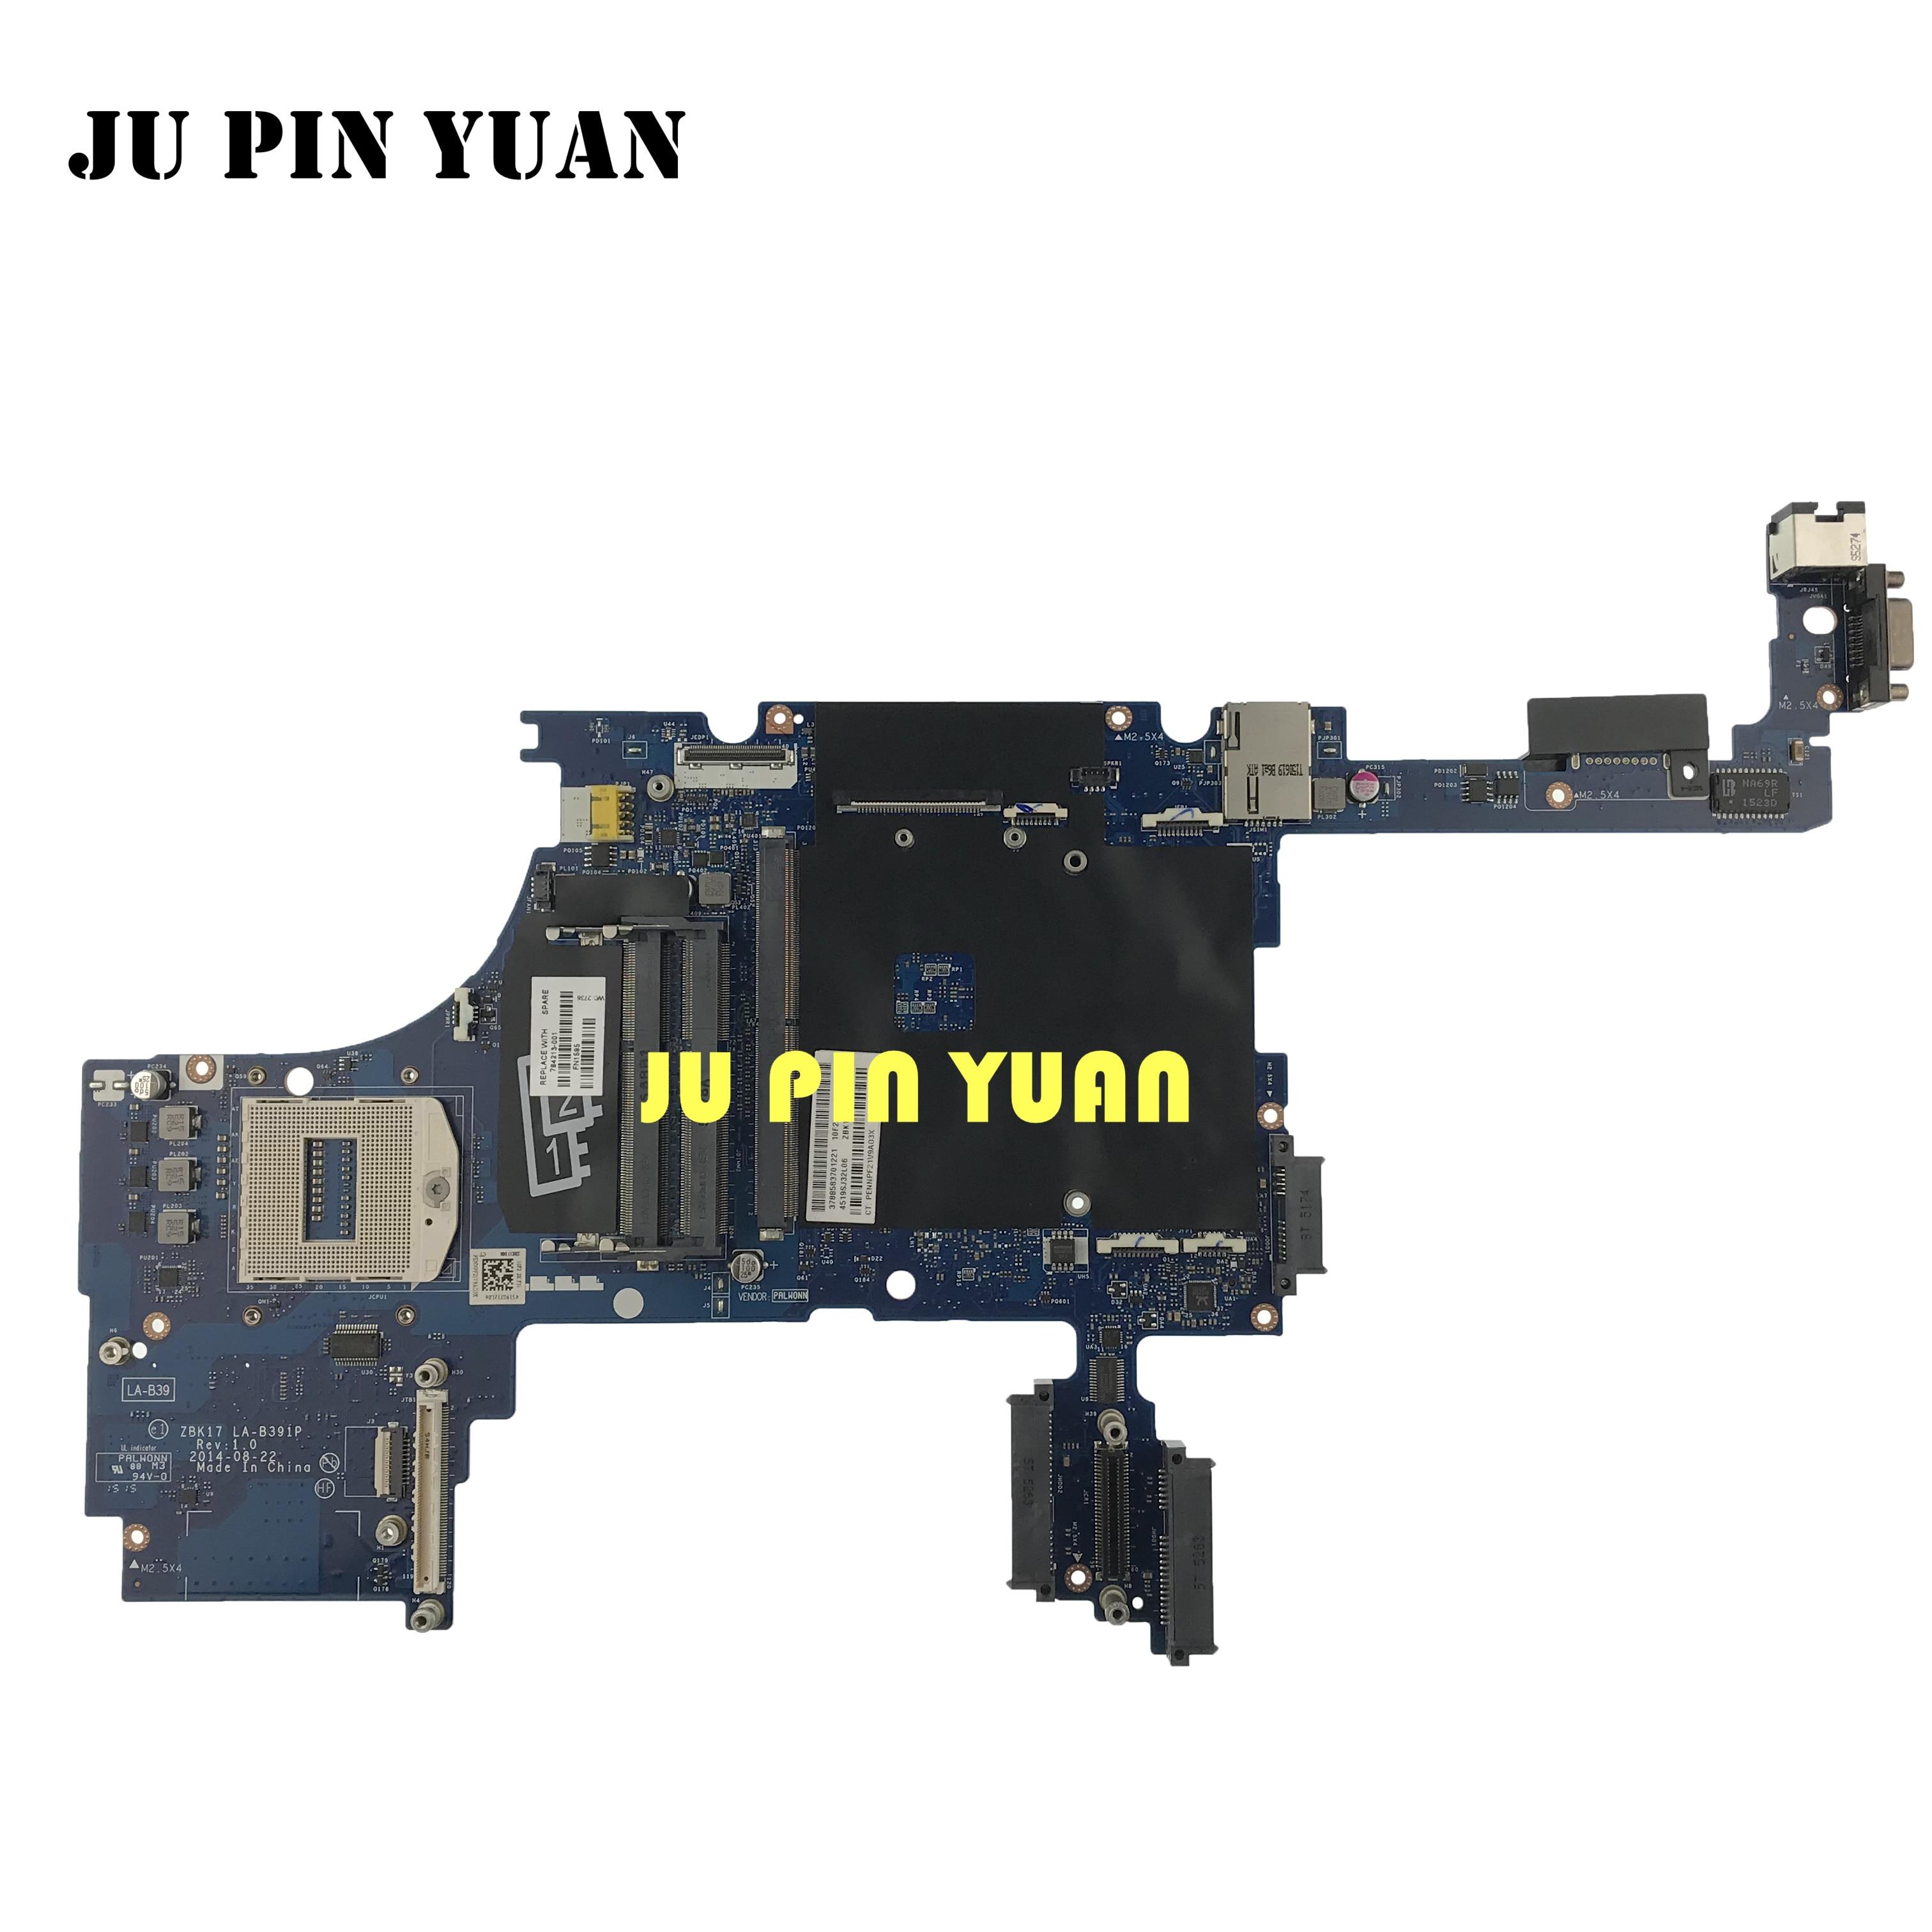 Ju Pin Yuan 784213 601 784213 501 784213 001 Placa Madre Para Hp Zbook 17 G2